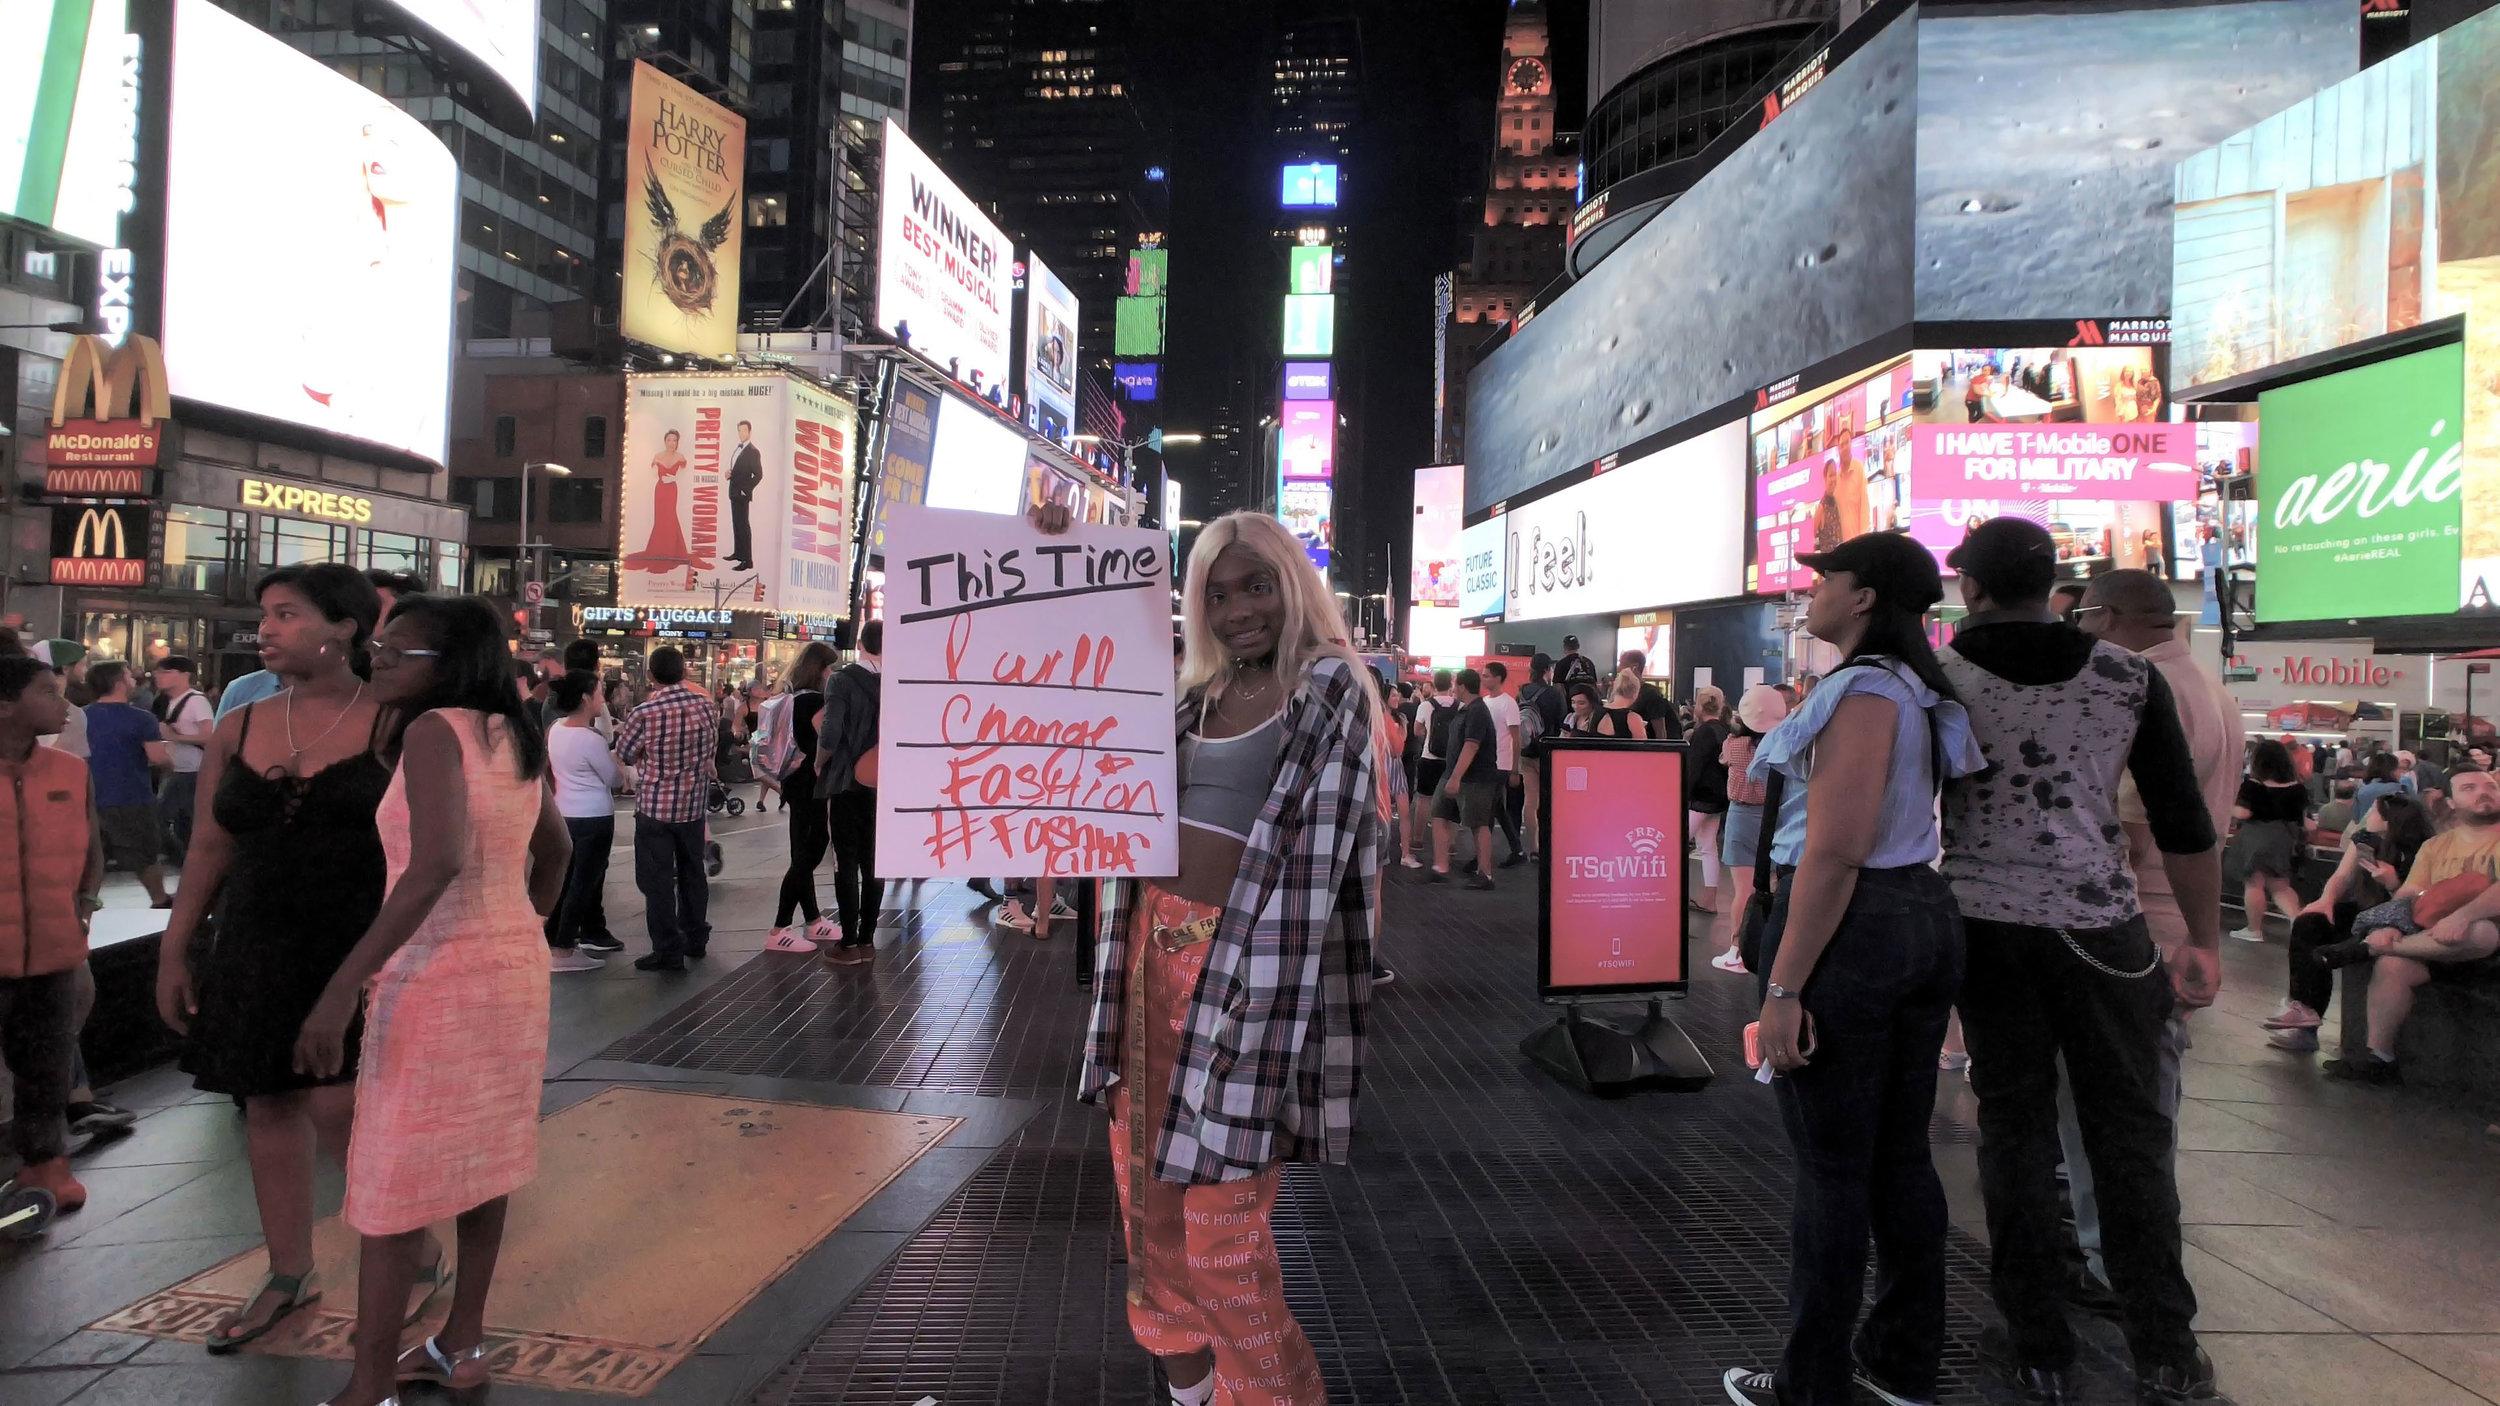 """This Time I will change fashion"" | Kajan | United States"